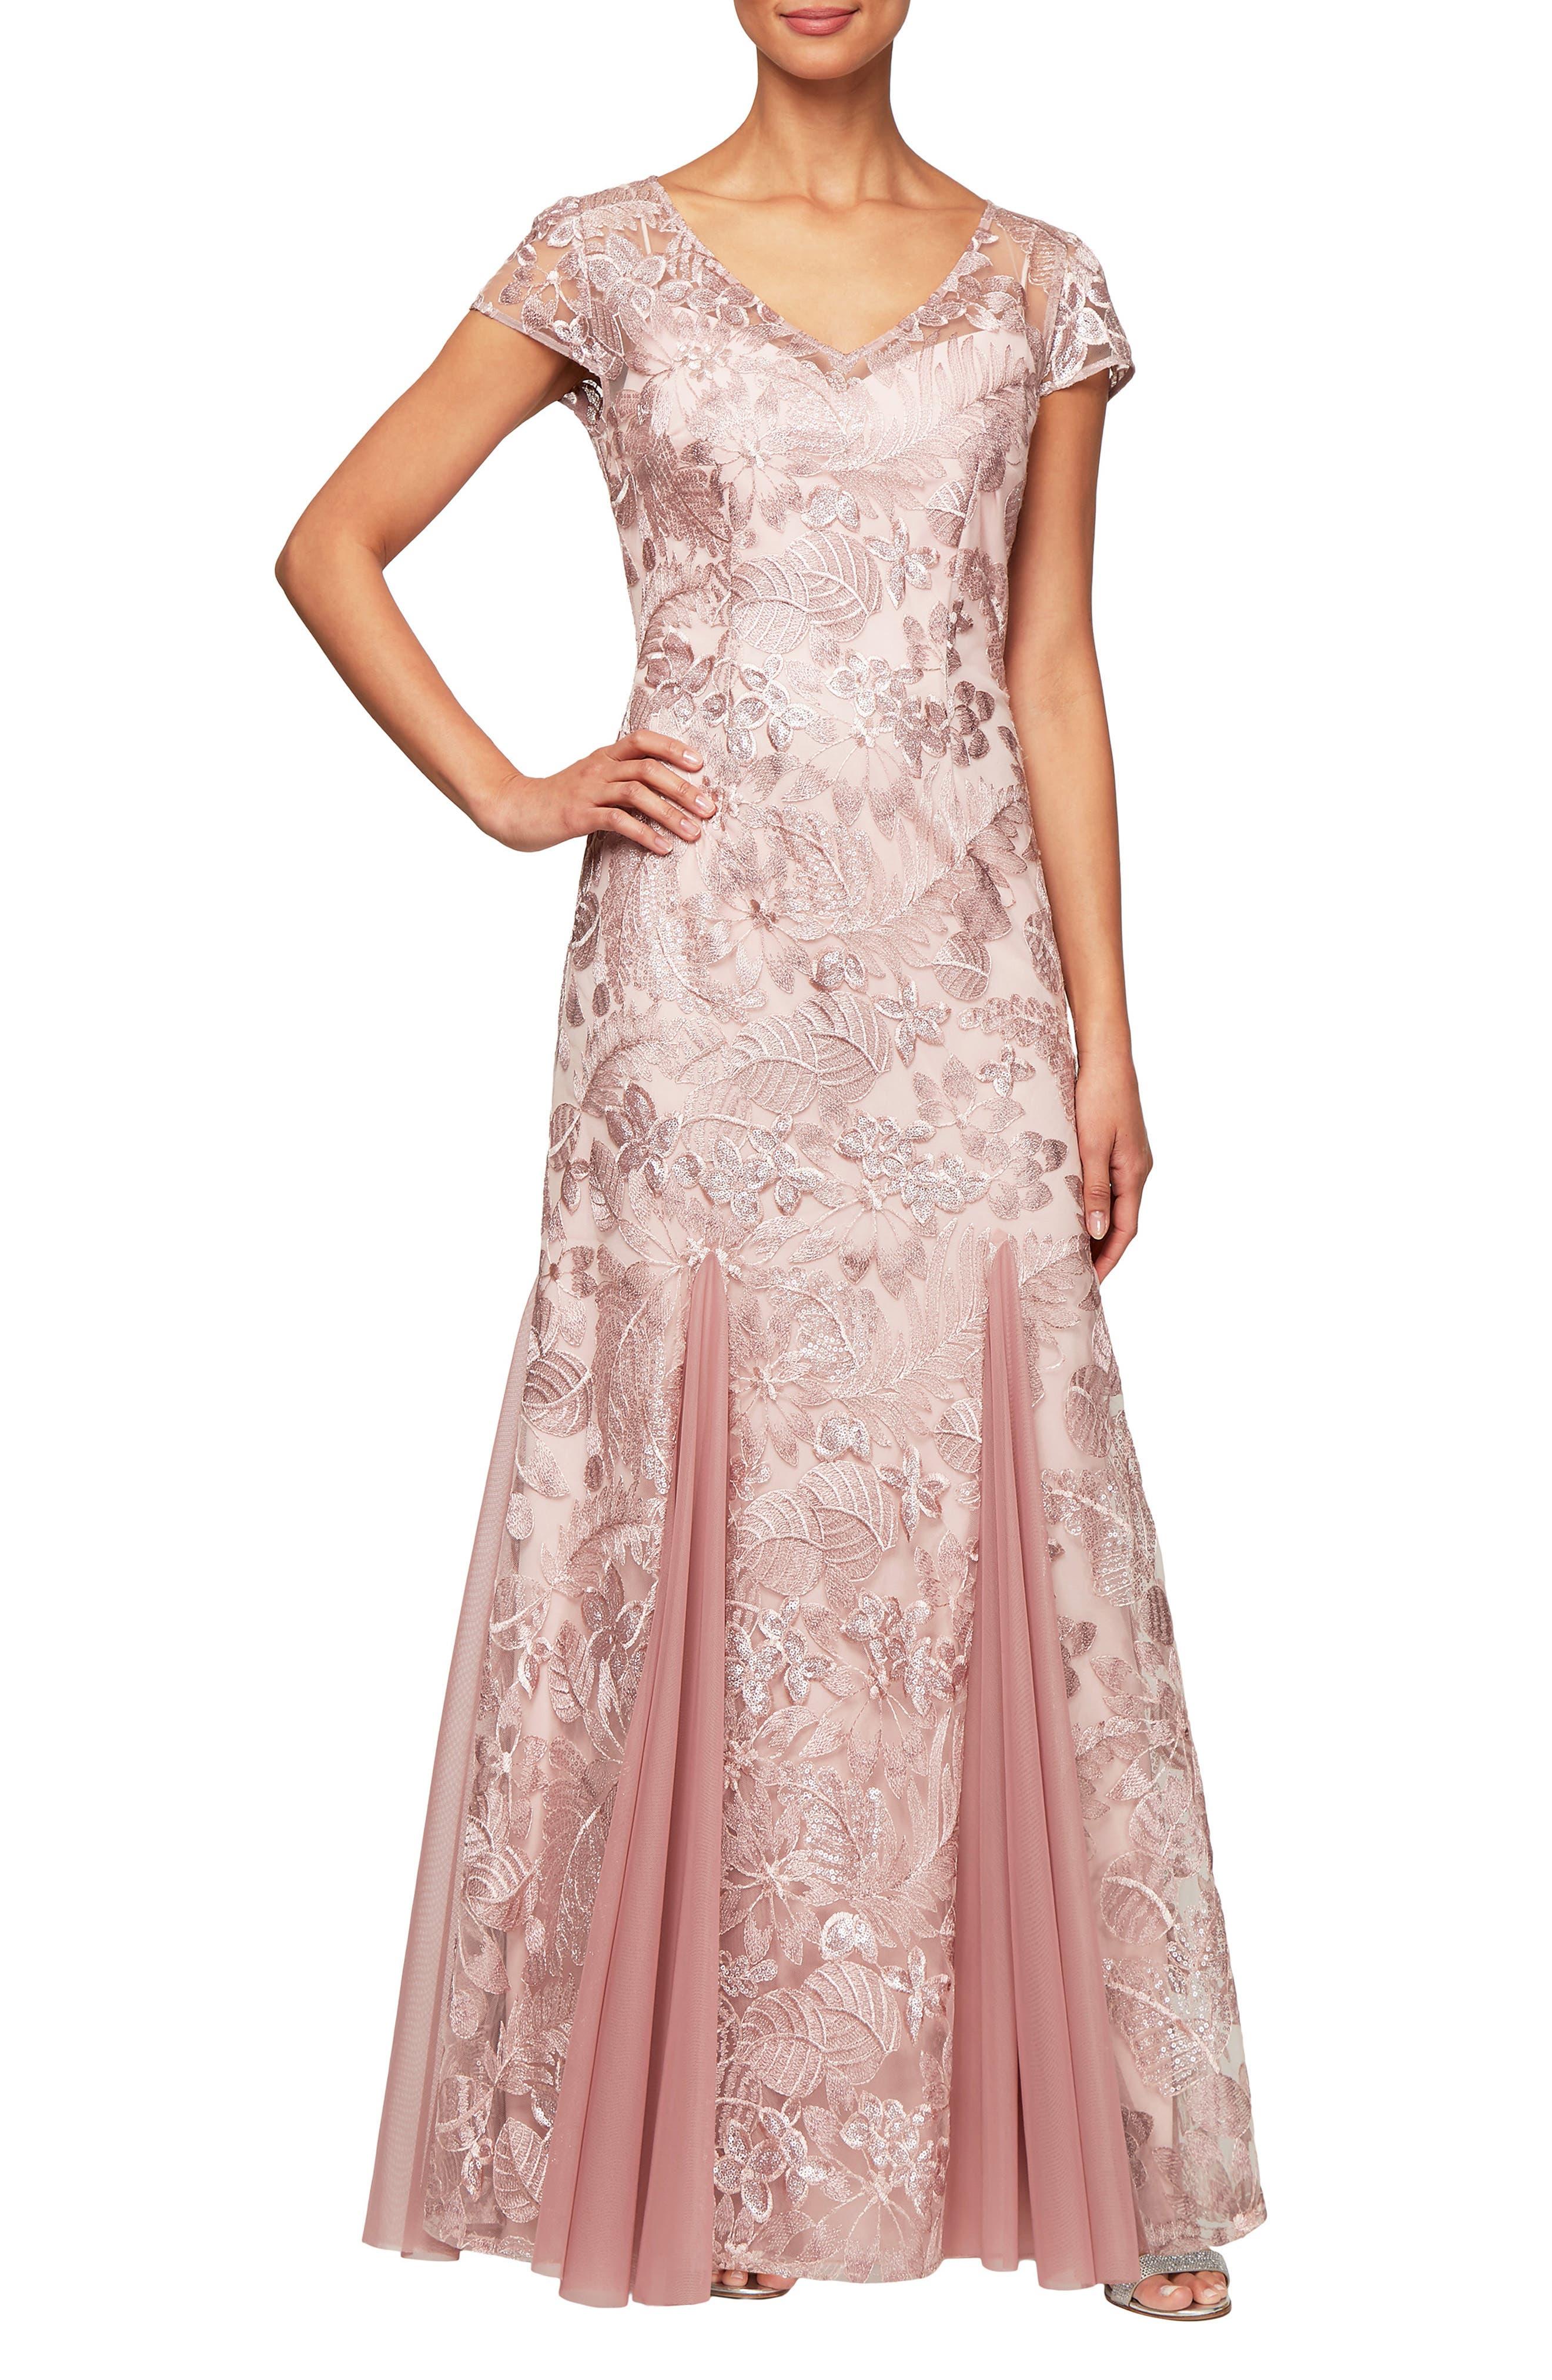 ALEX EVENINGS,                             V-Neck Embroidered Evening Dress,                             Main thumbnail 1, color,                             BLOSSOM